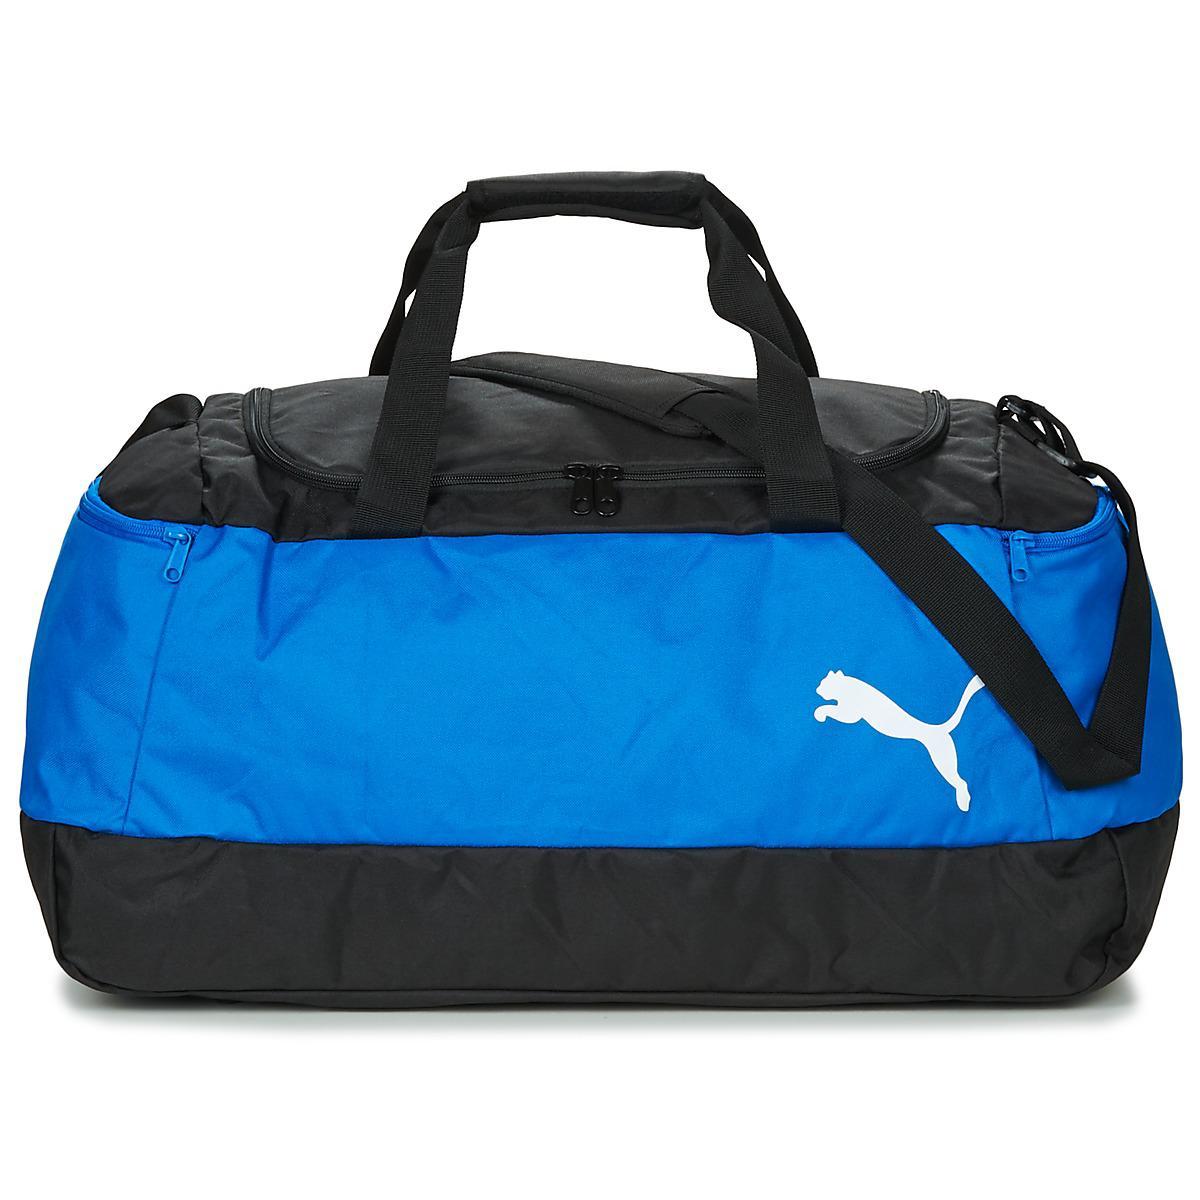 PUMA Pro Training Ii Medium Bag Women s Sports Bag In Black in Black ... 09fac2934cb3b